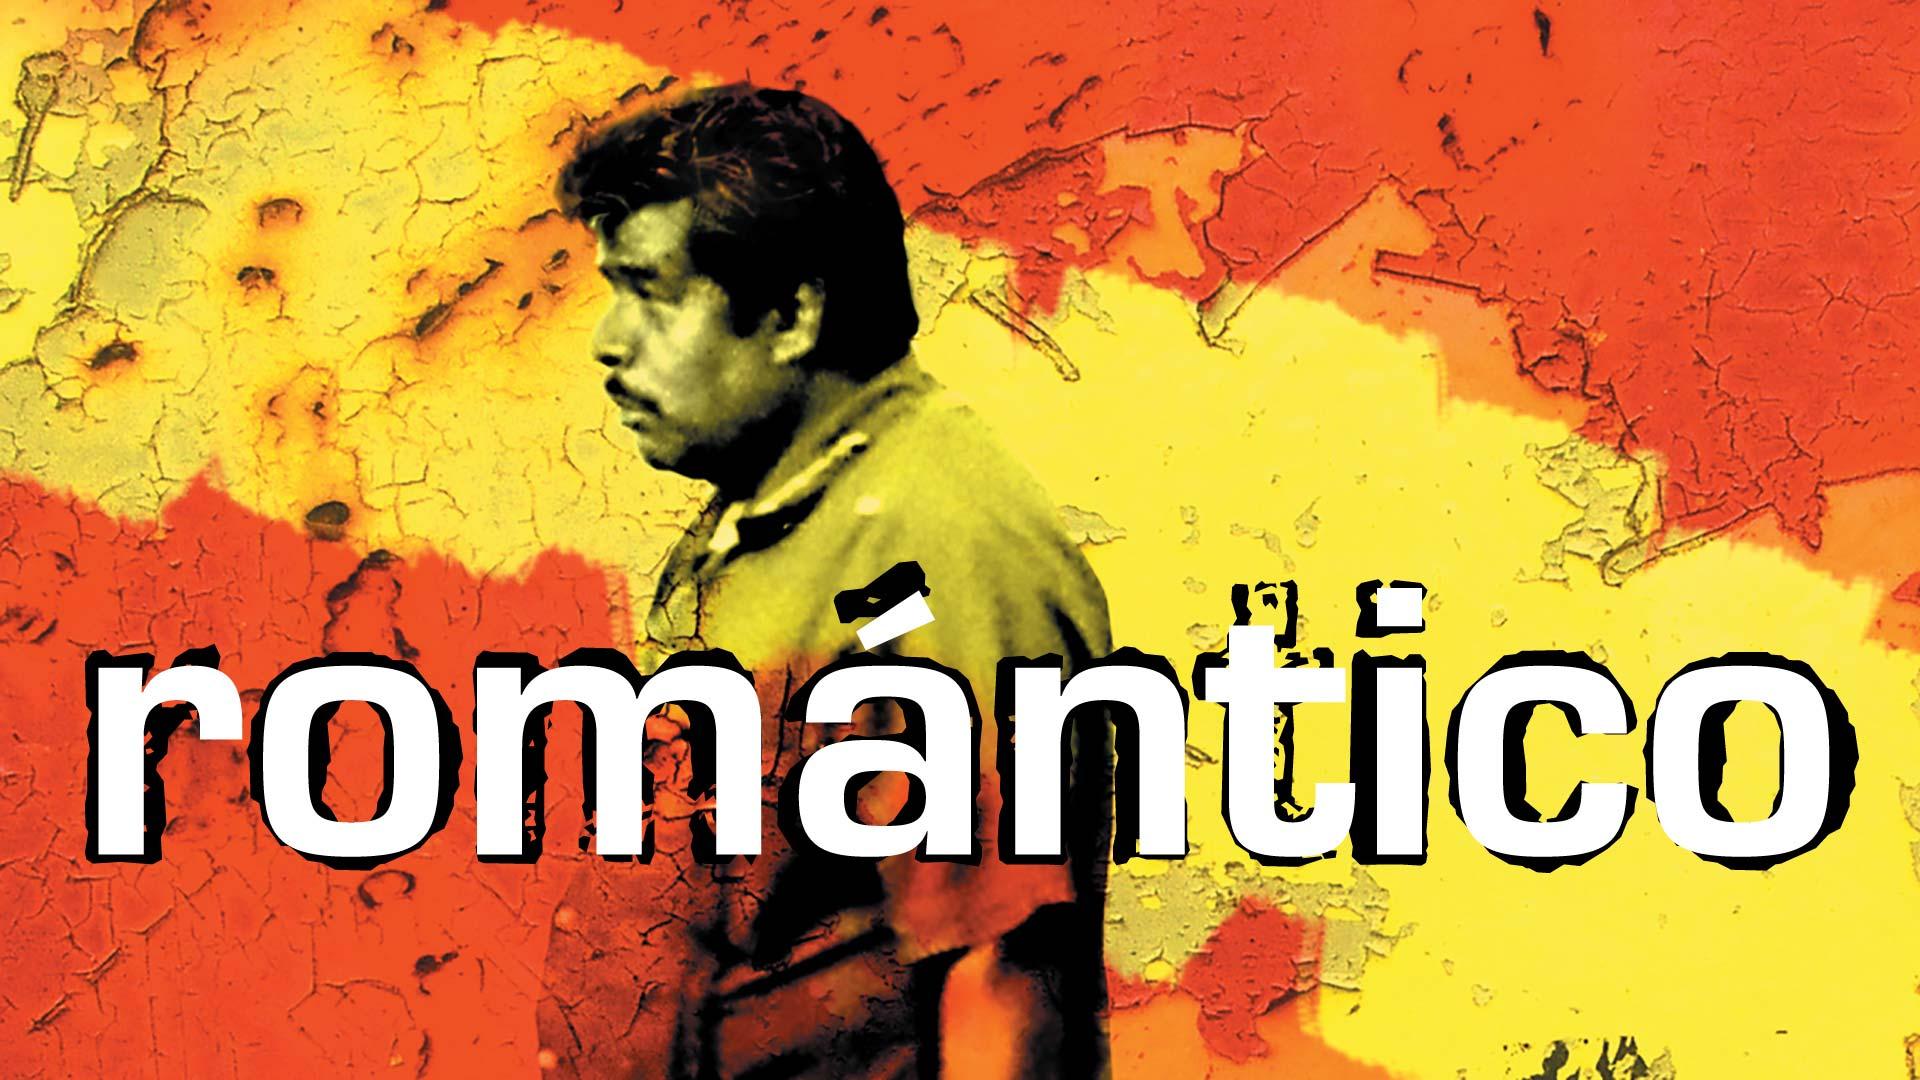 Romantico - image